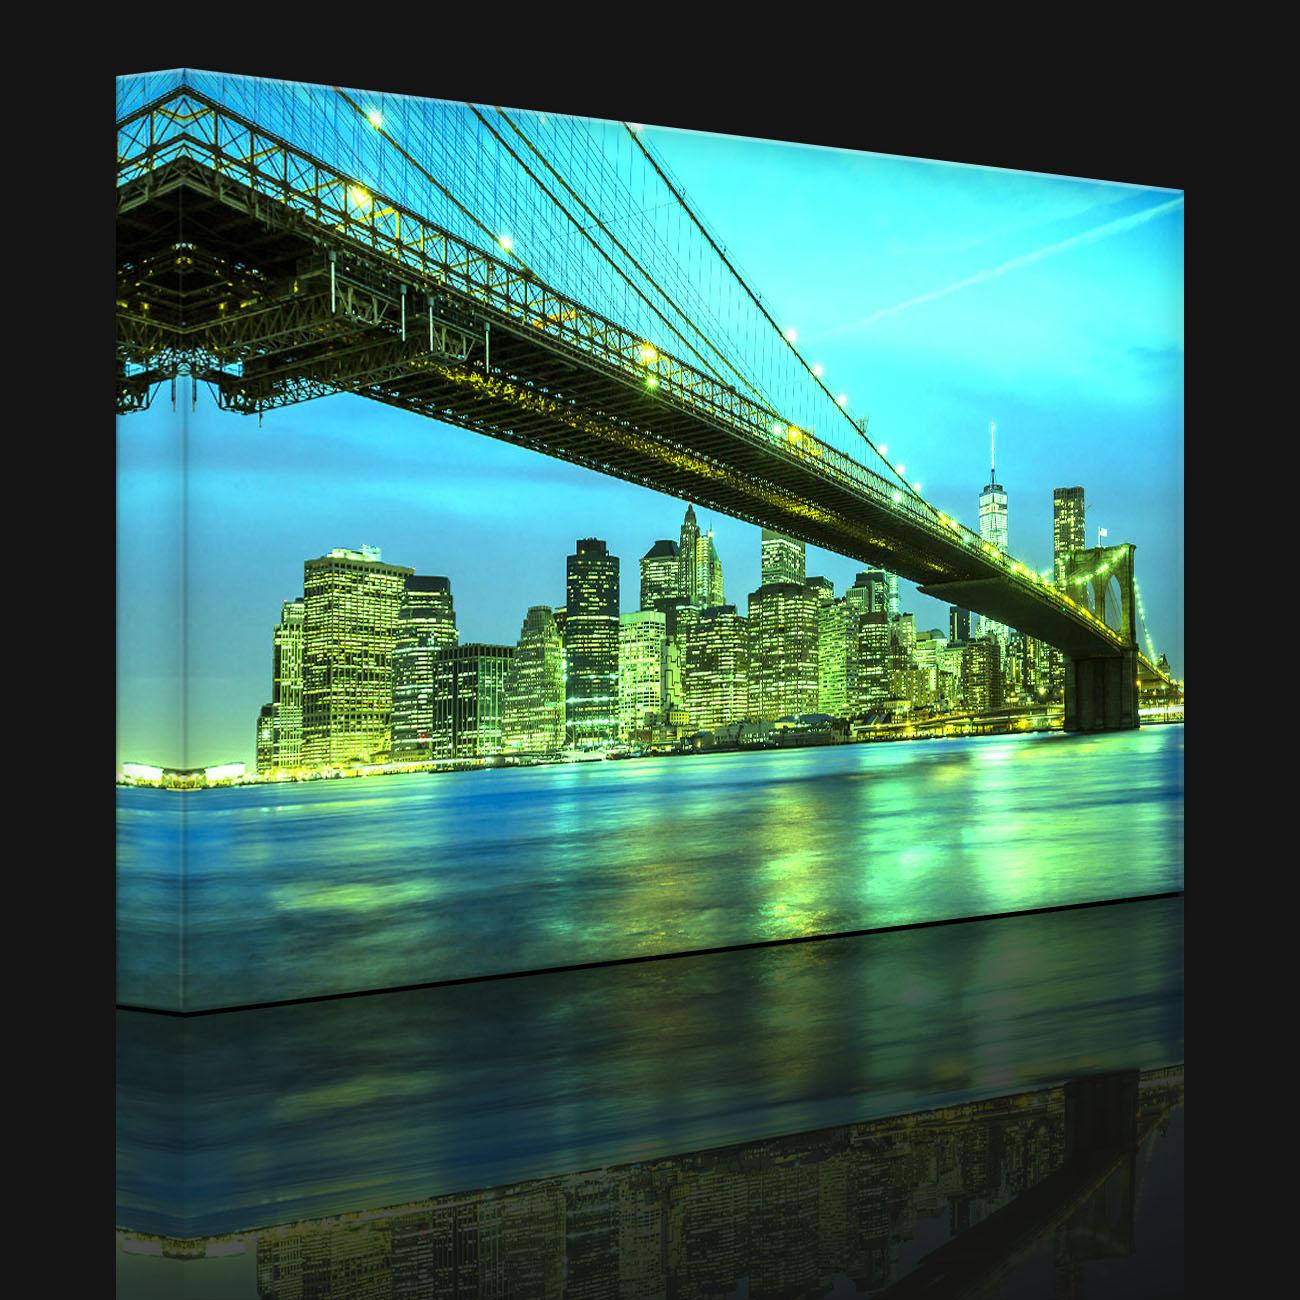 tableau illumin image led new york brooklyn bridge fully lighted ebay. Black Bedroom Furniture Sets. Home Design Ideas